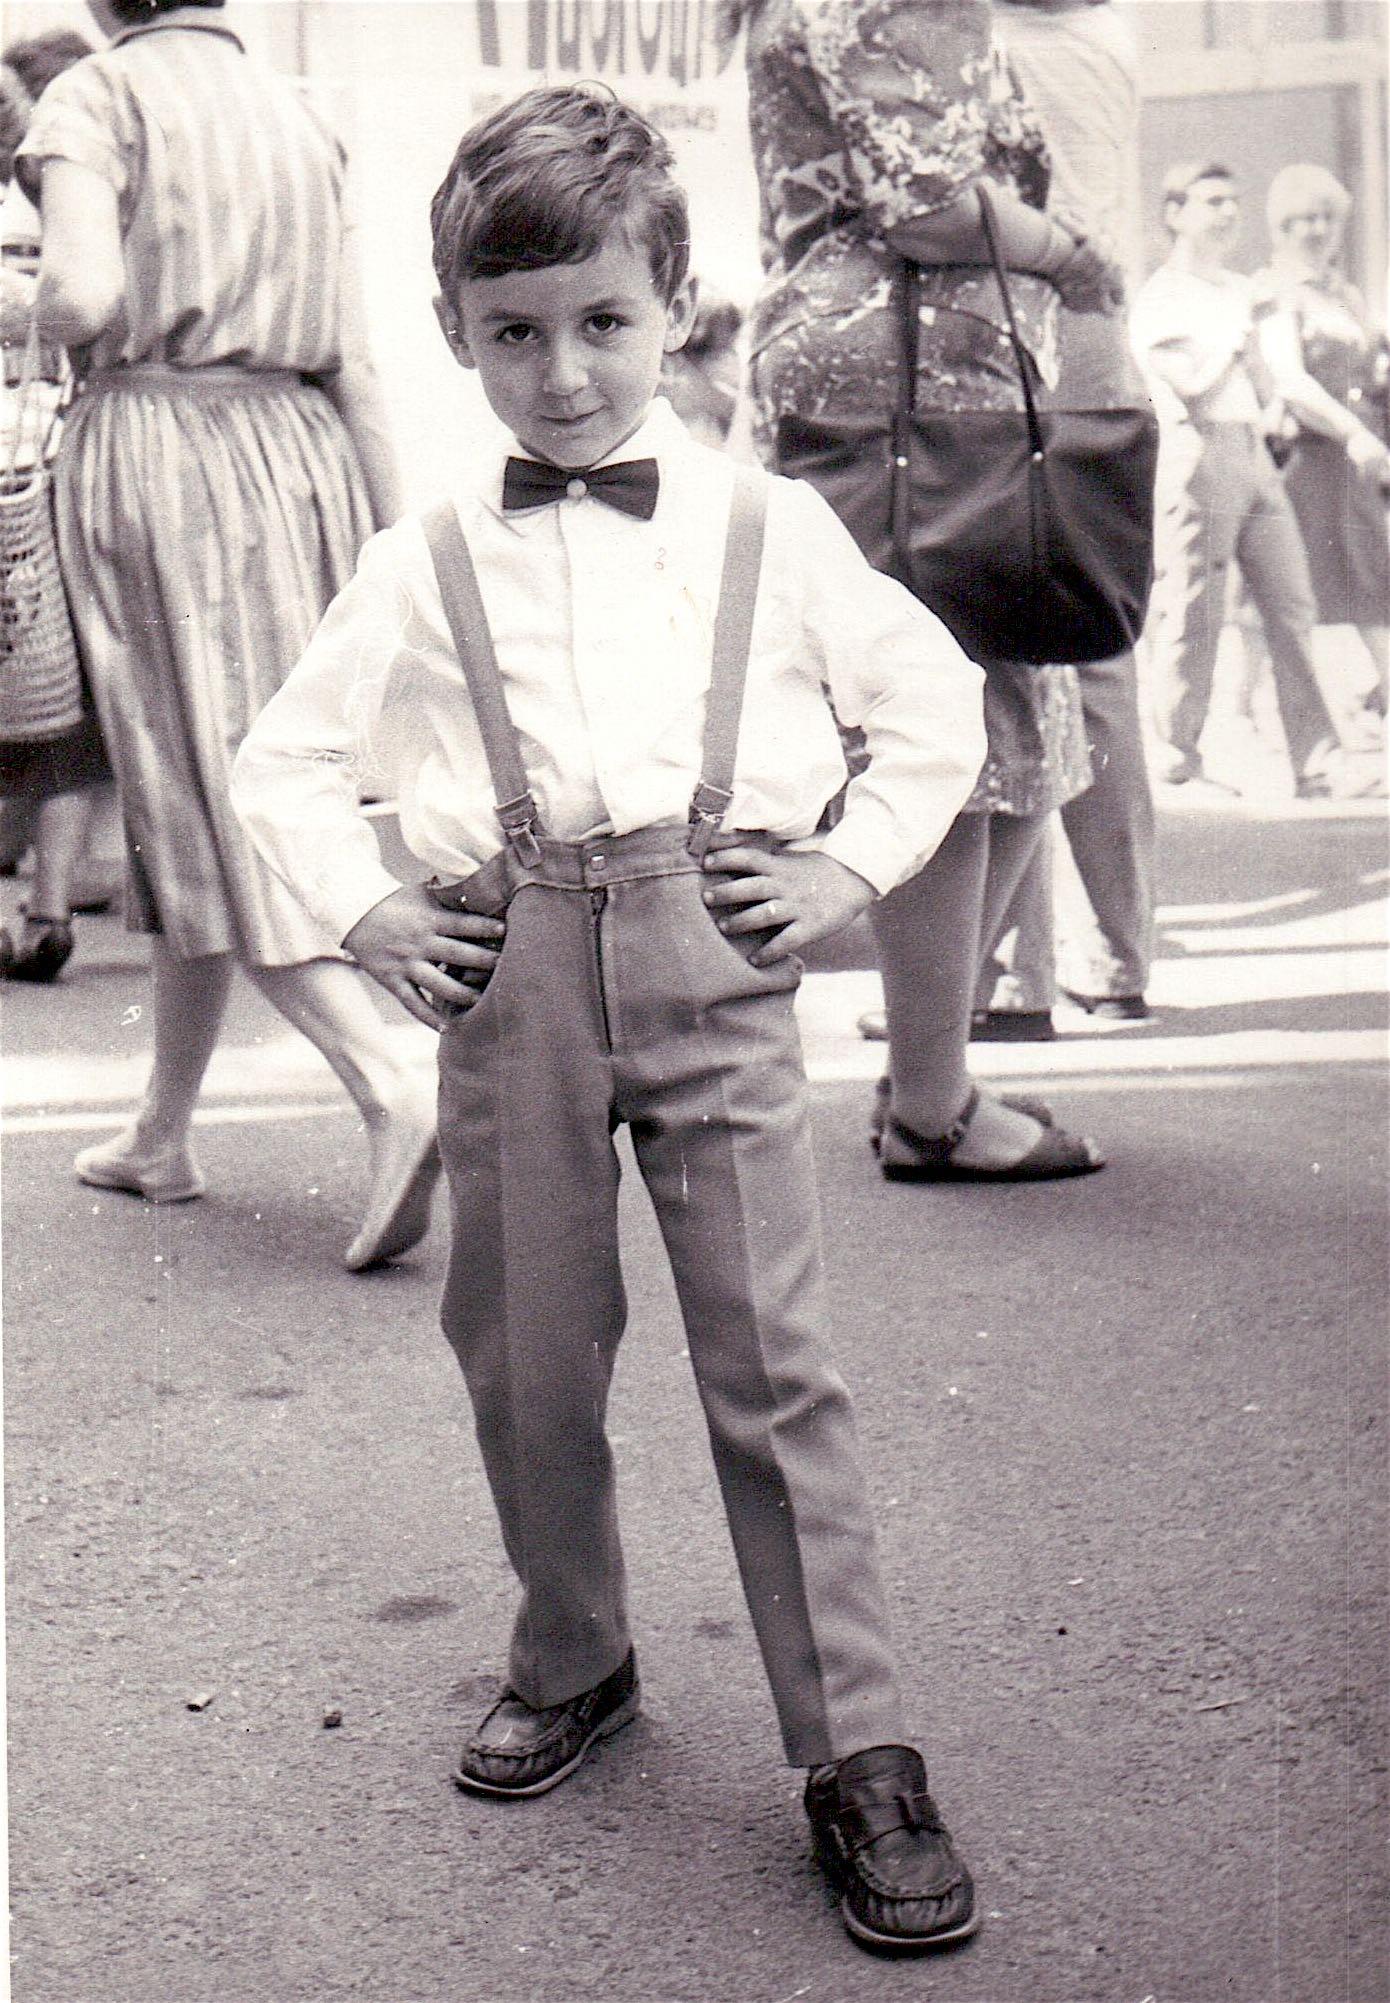 Kostya Kimlat as a child in Kiev, Ukraine in the Soviet Union.